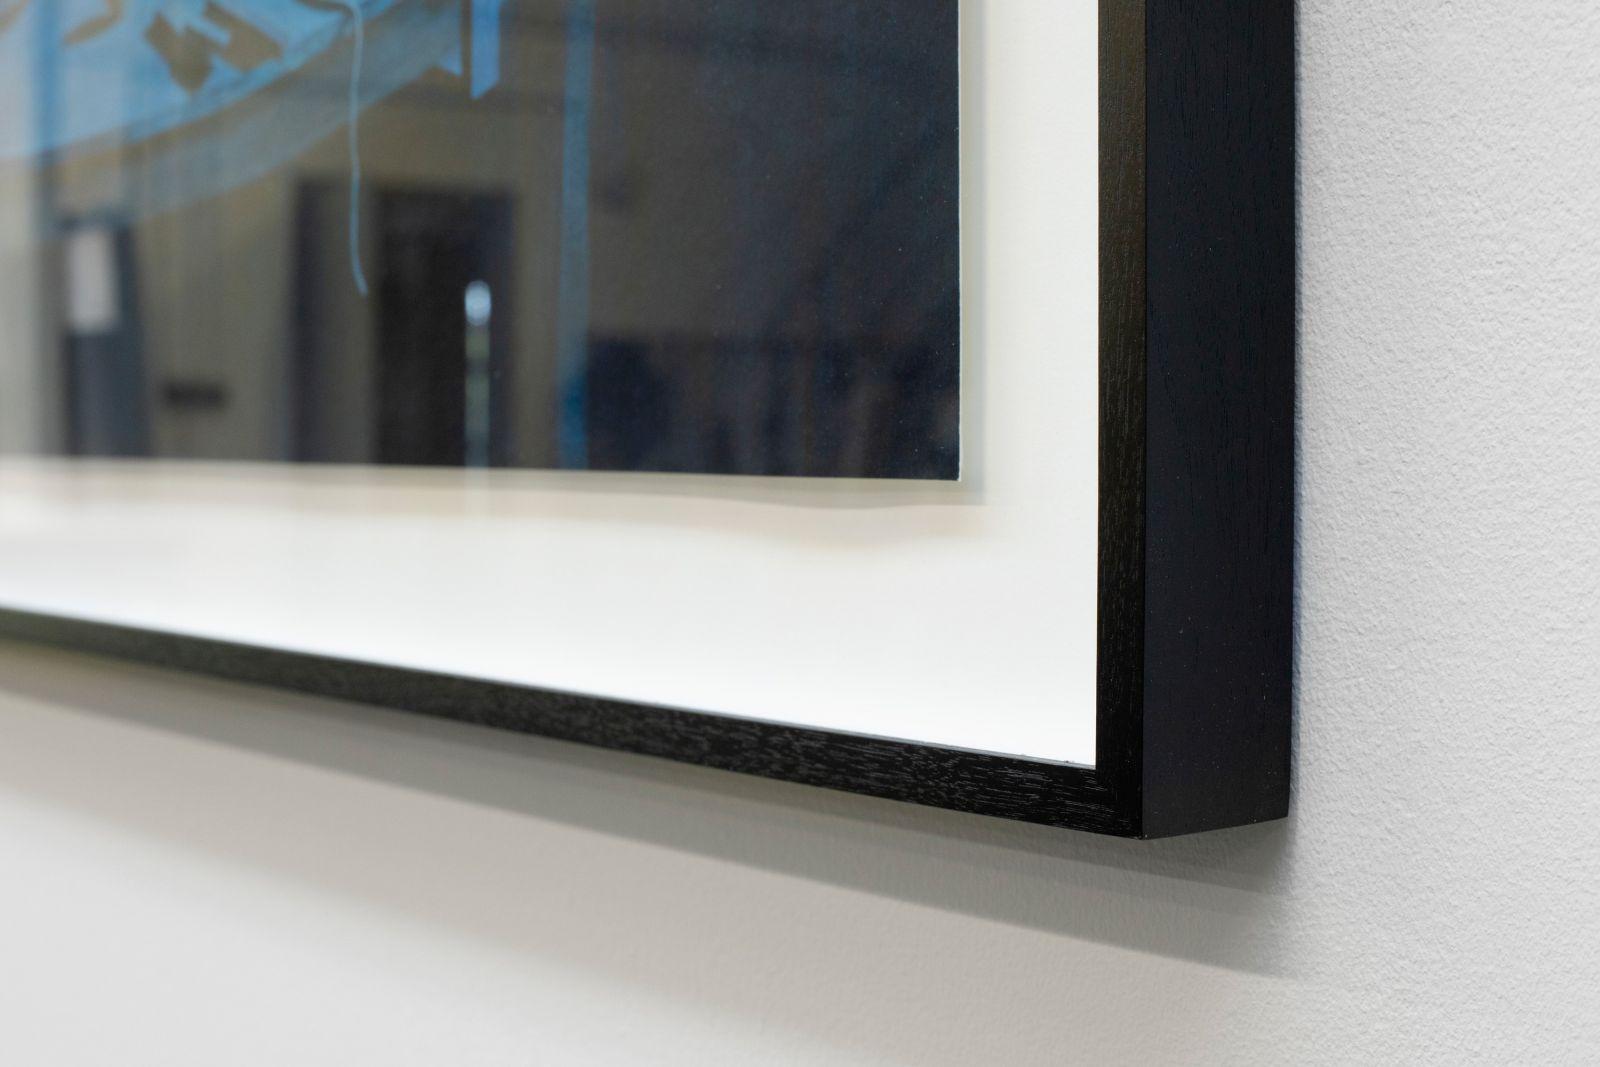 Acrylic on Hahnemuhle paper, Framed, museum glas, black walnut-wood